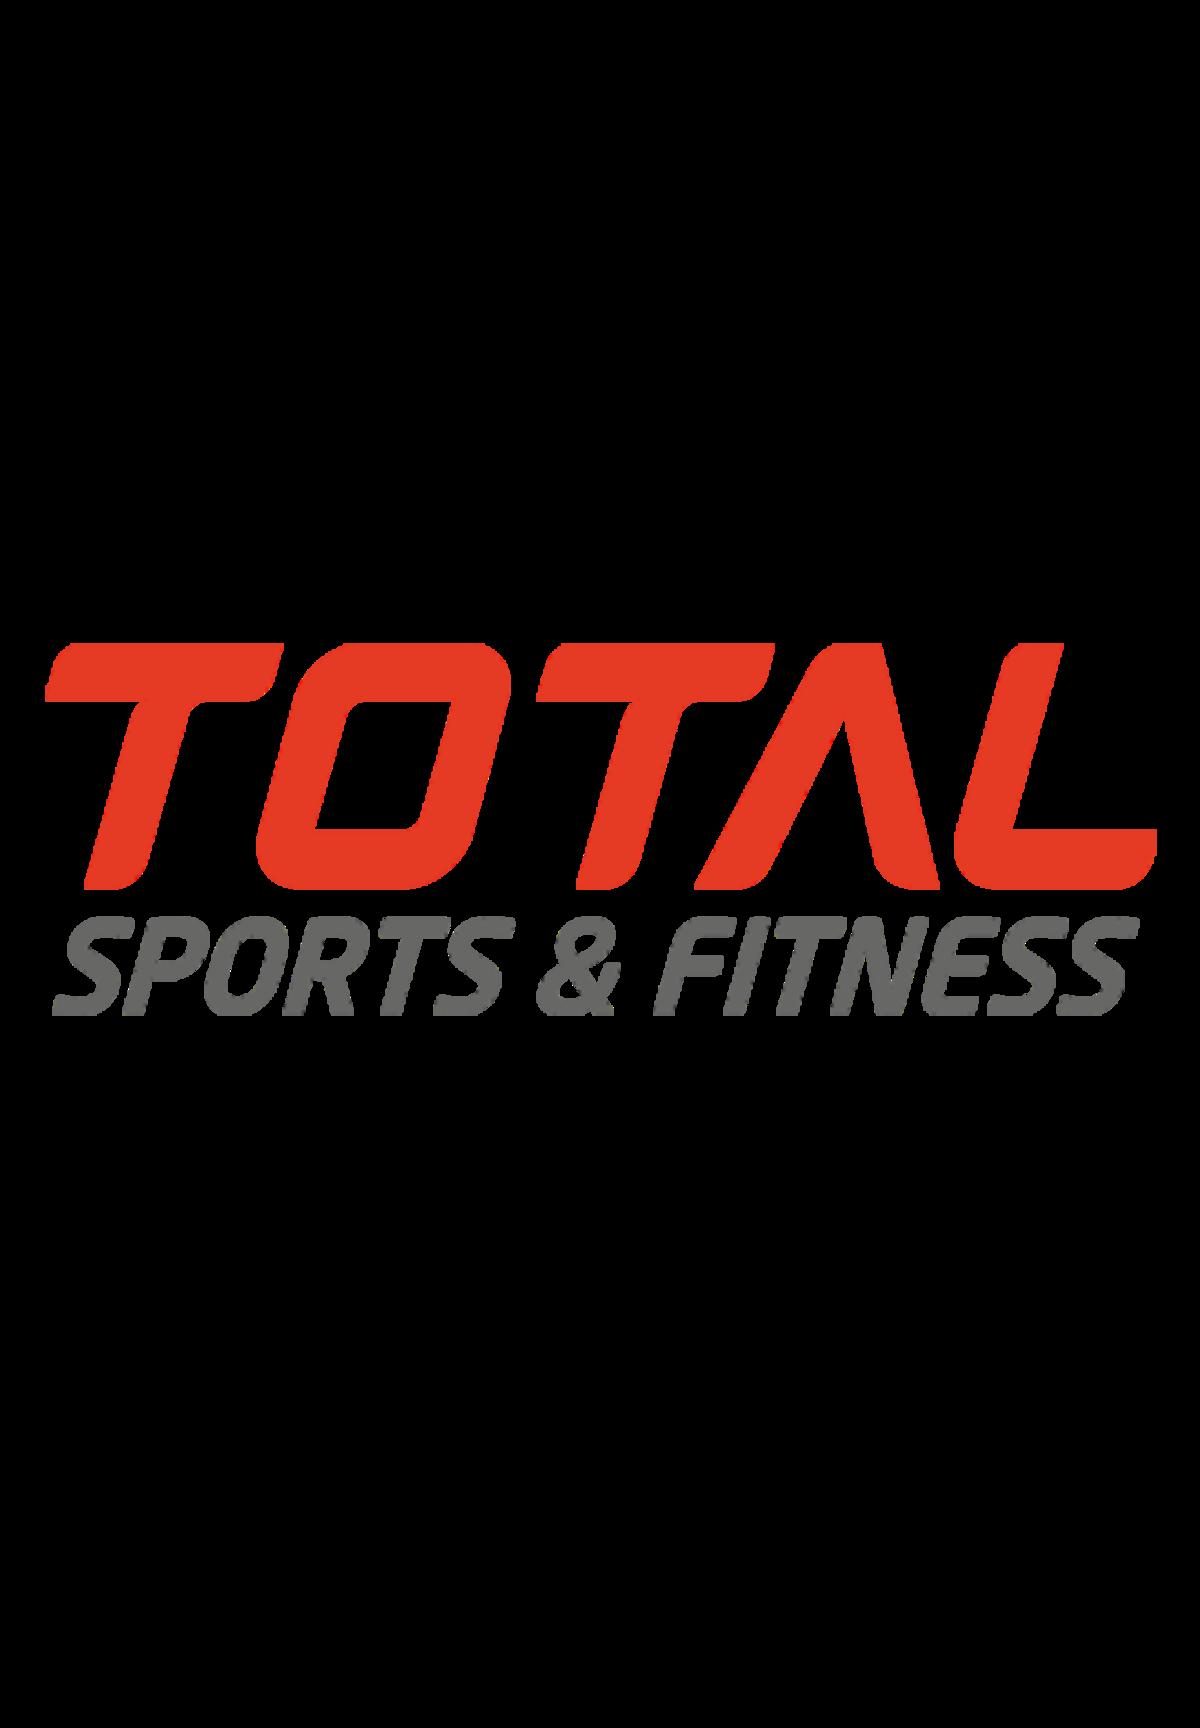 Actofit Total Sports